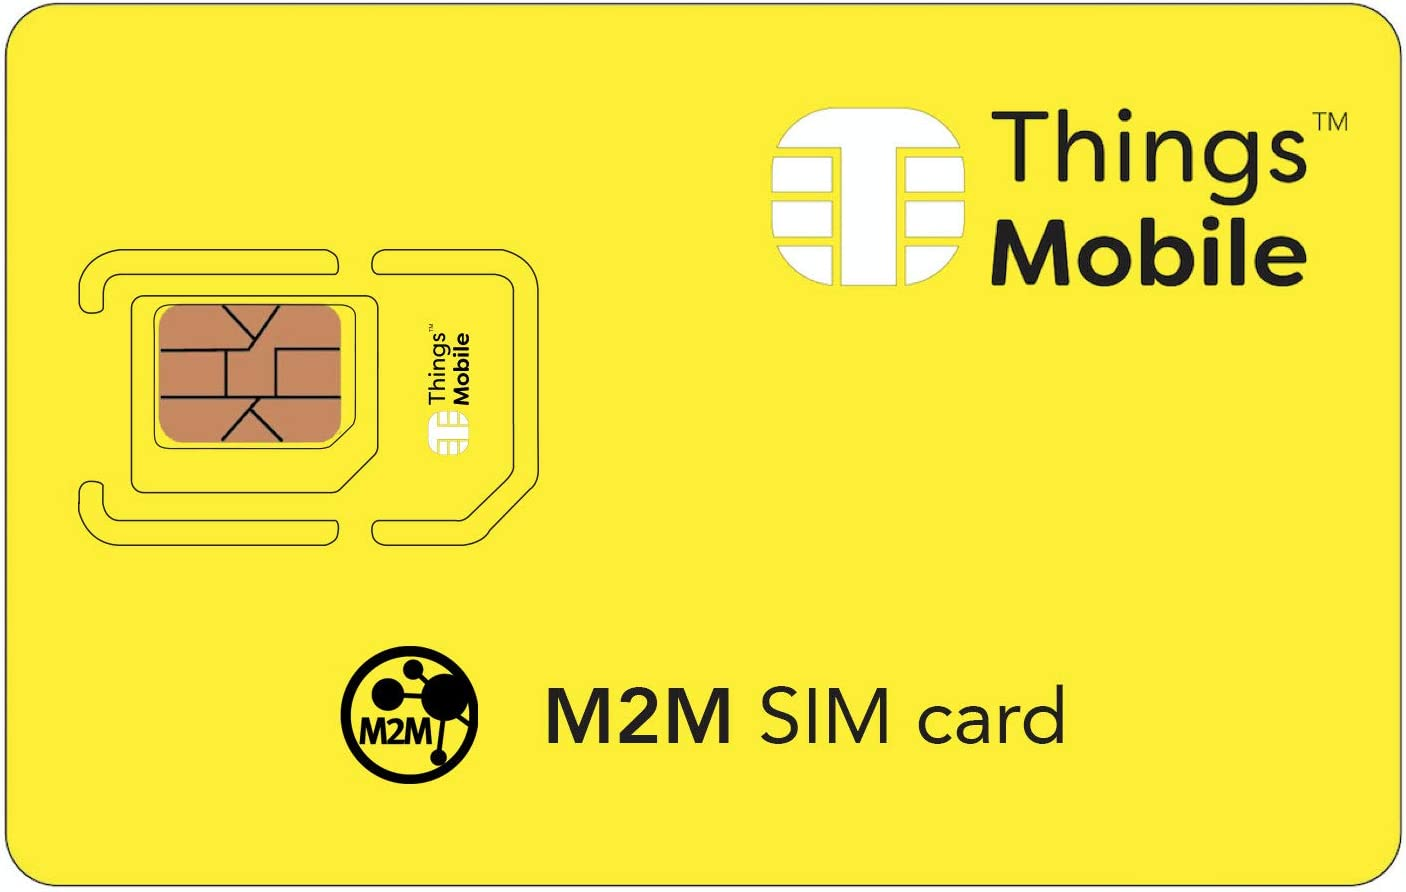 carte sim m2m bouygues Amazon.com: SIM Card for M2M (Machine 2 Machine) Devices with